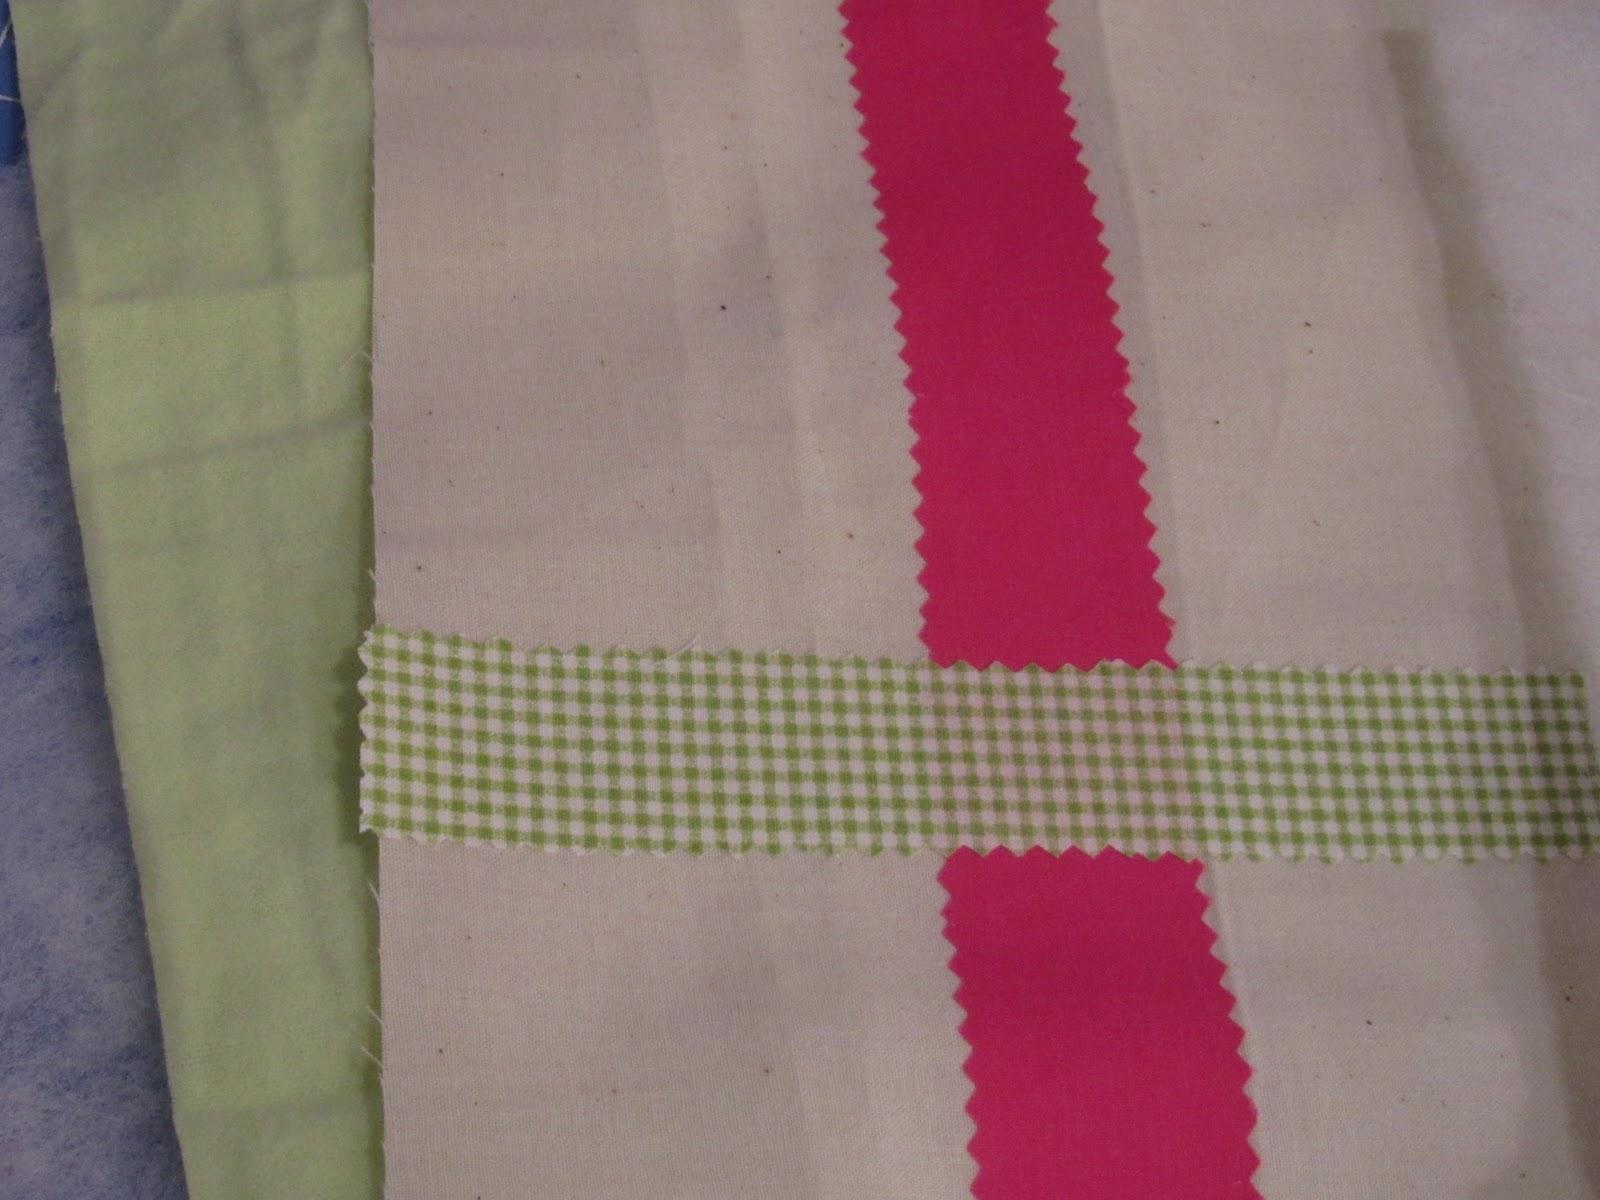 Fleece Fabric Crafts